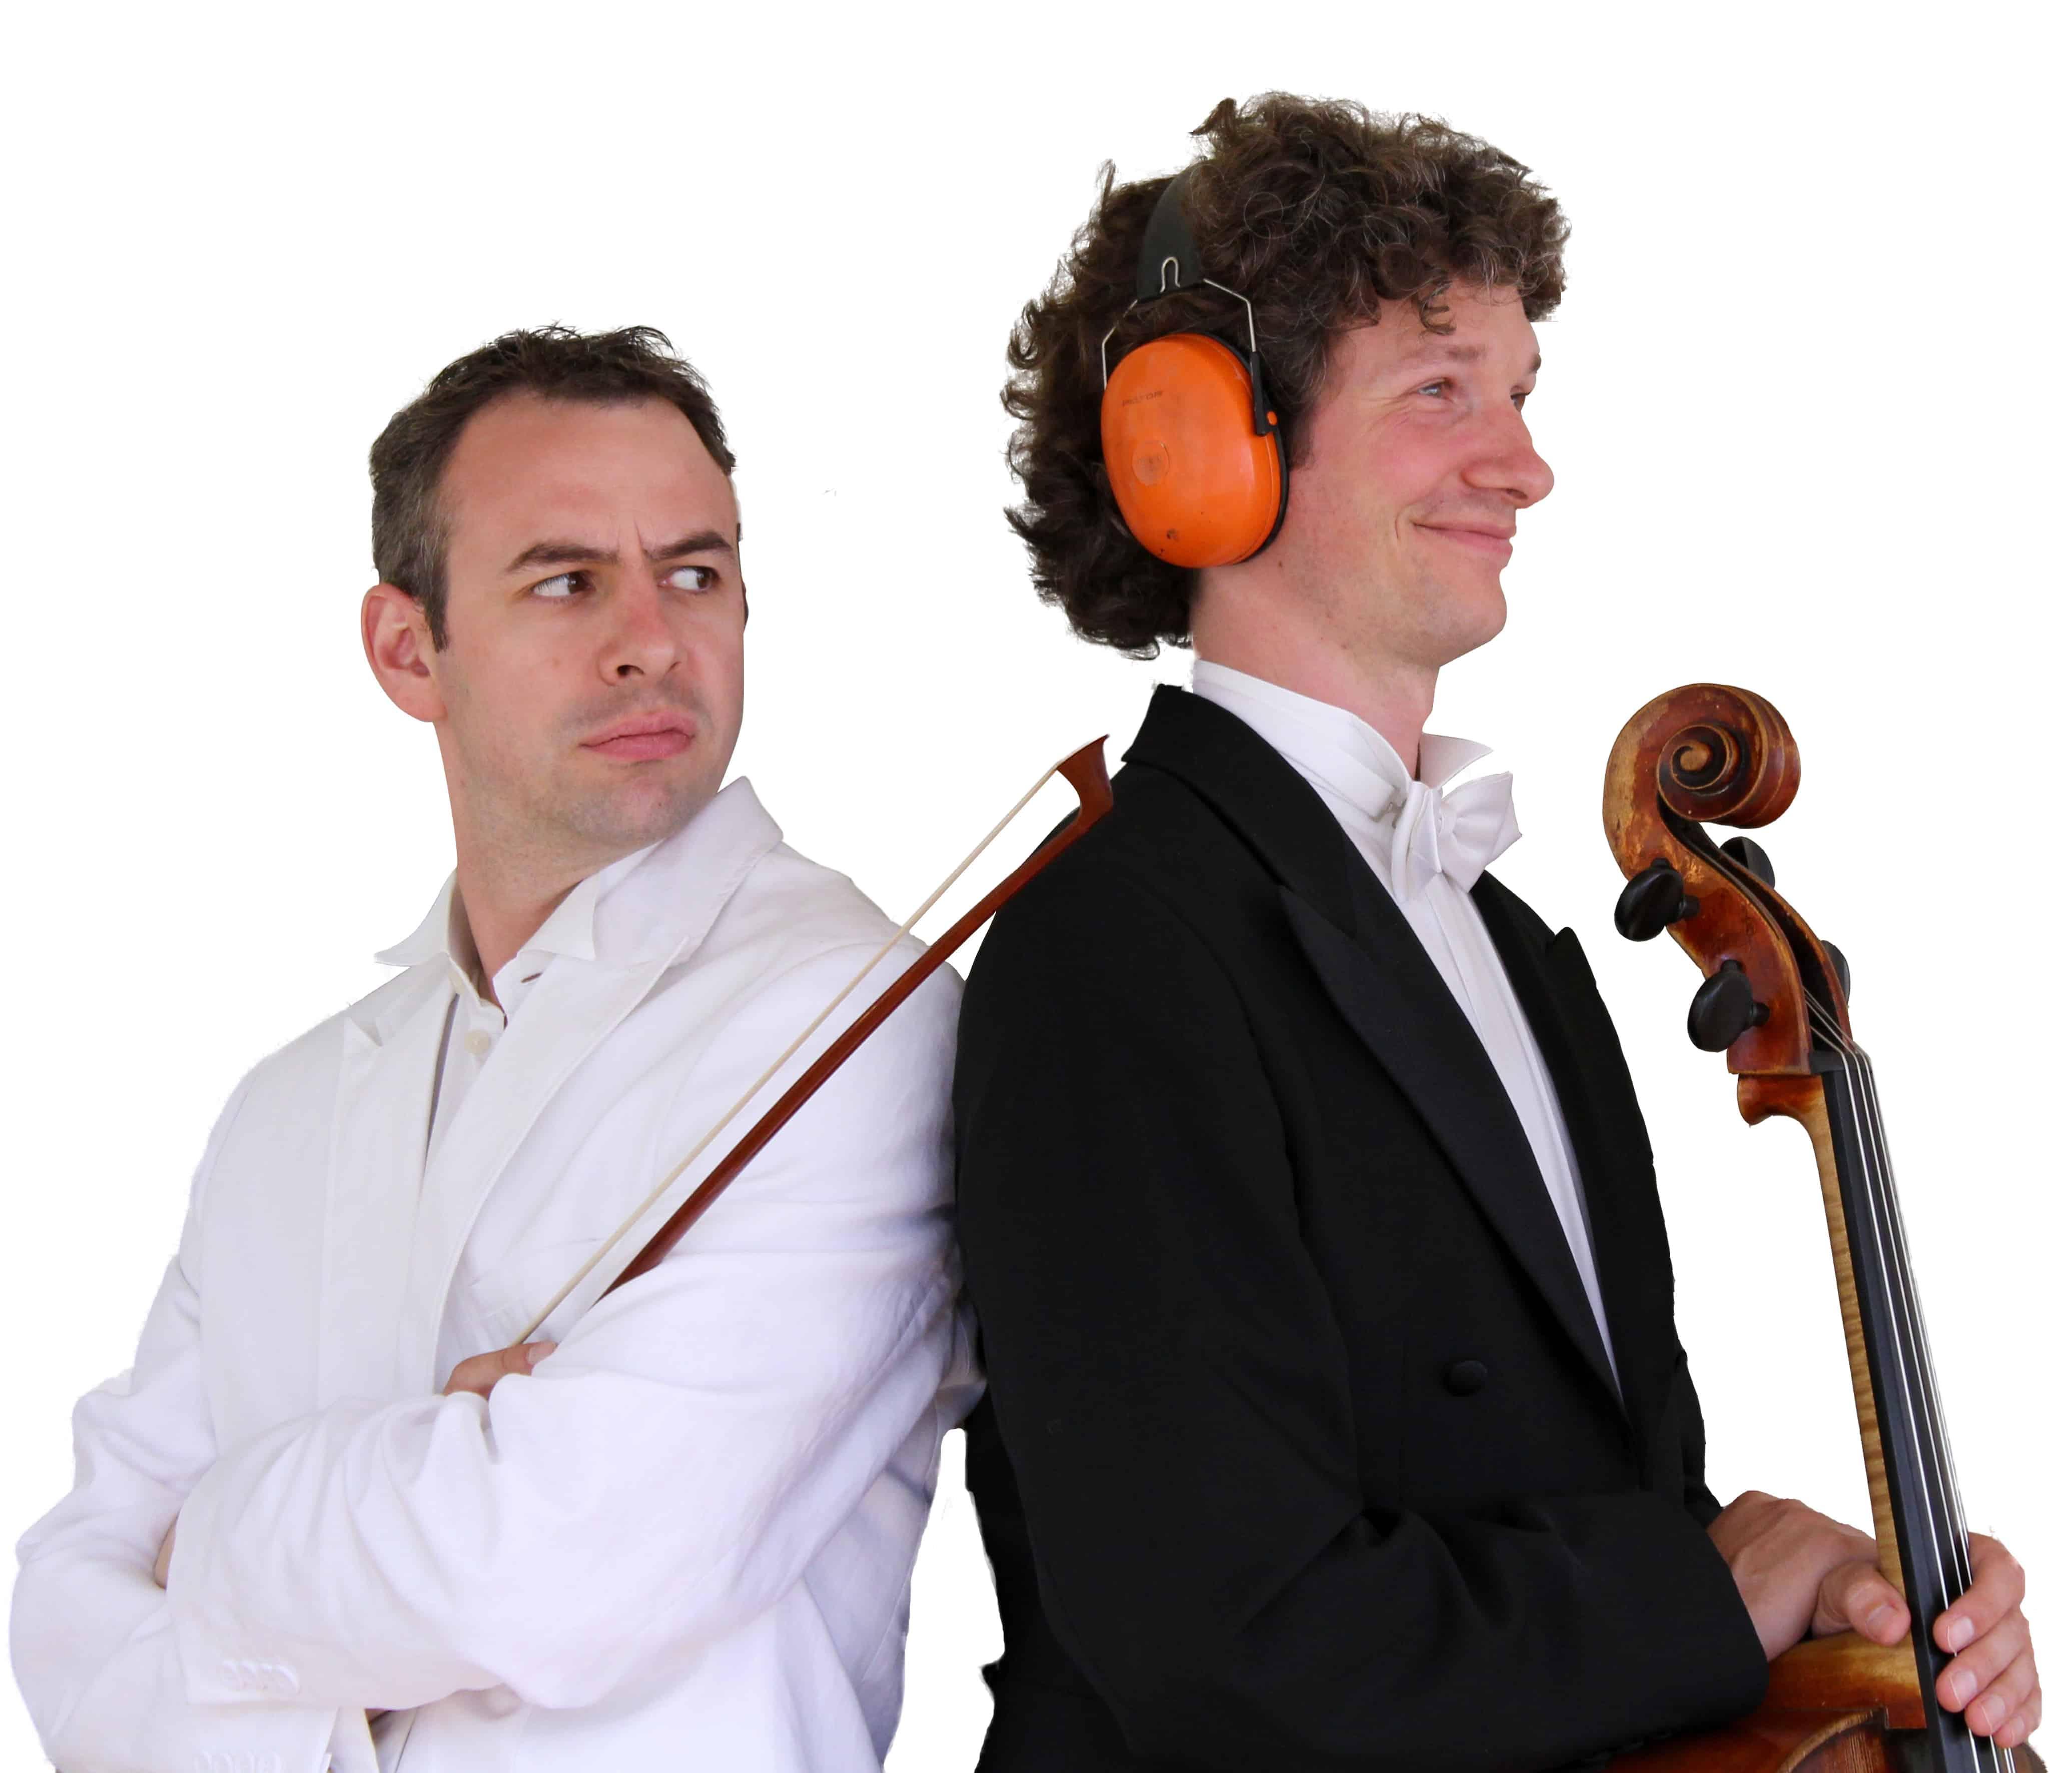 Duo Calva gastiert mit Best of-Tournee am 5. Januar im Turmtheater Regensburg